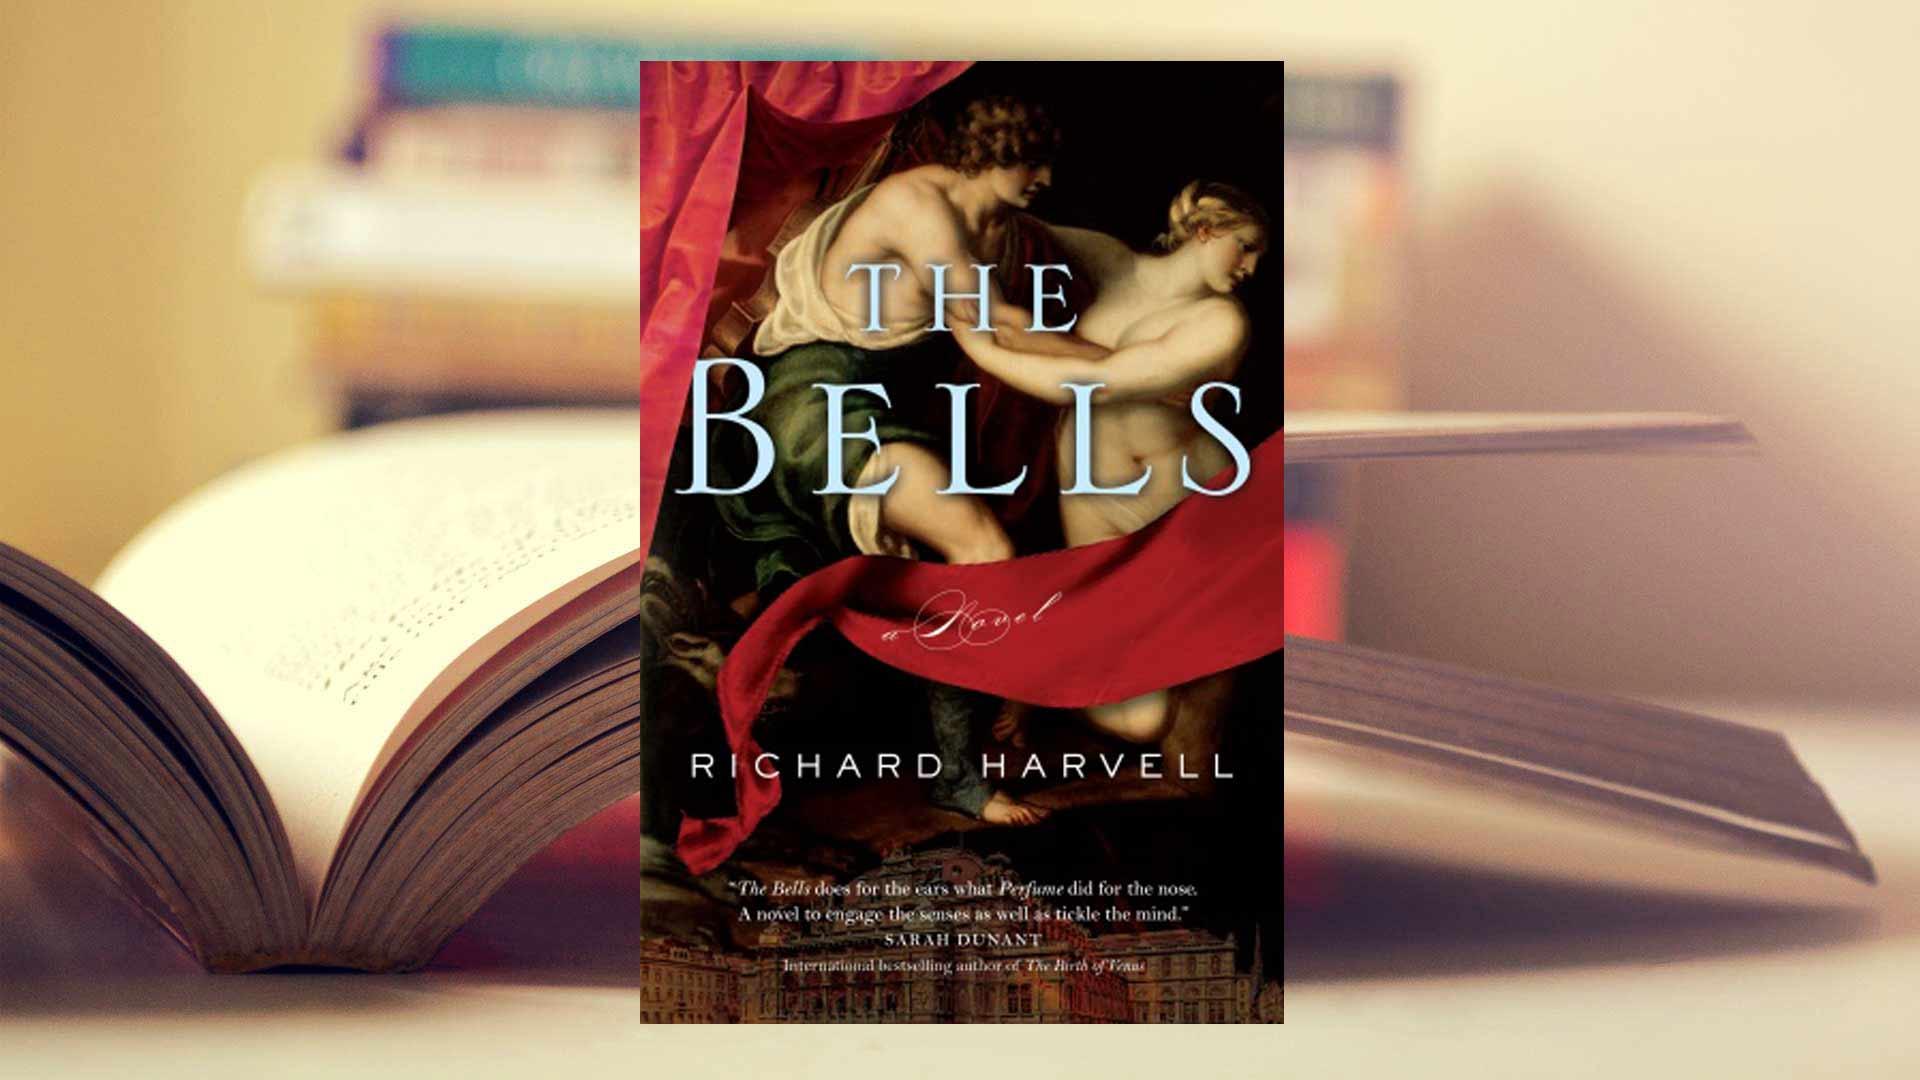 THE BELLS – A Novel by RICHARD HARVELL